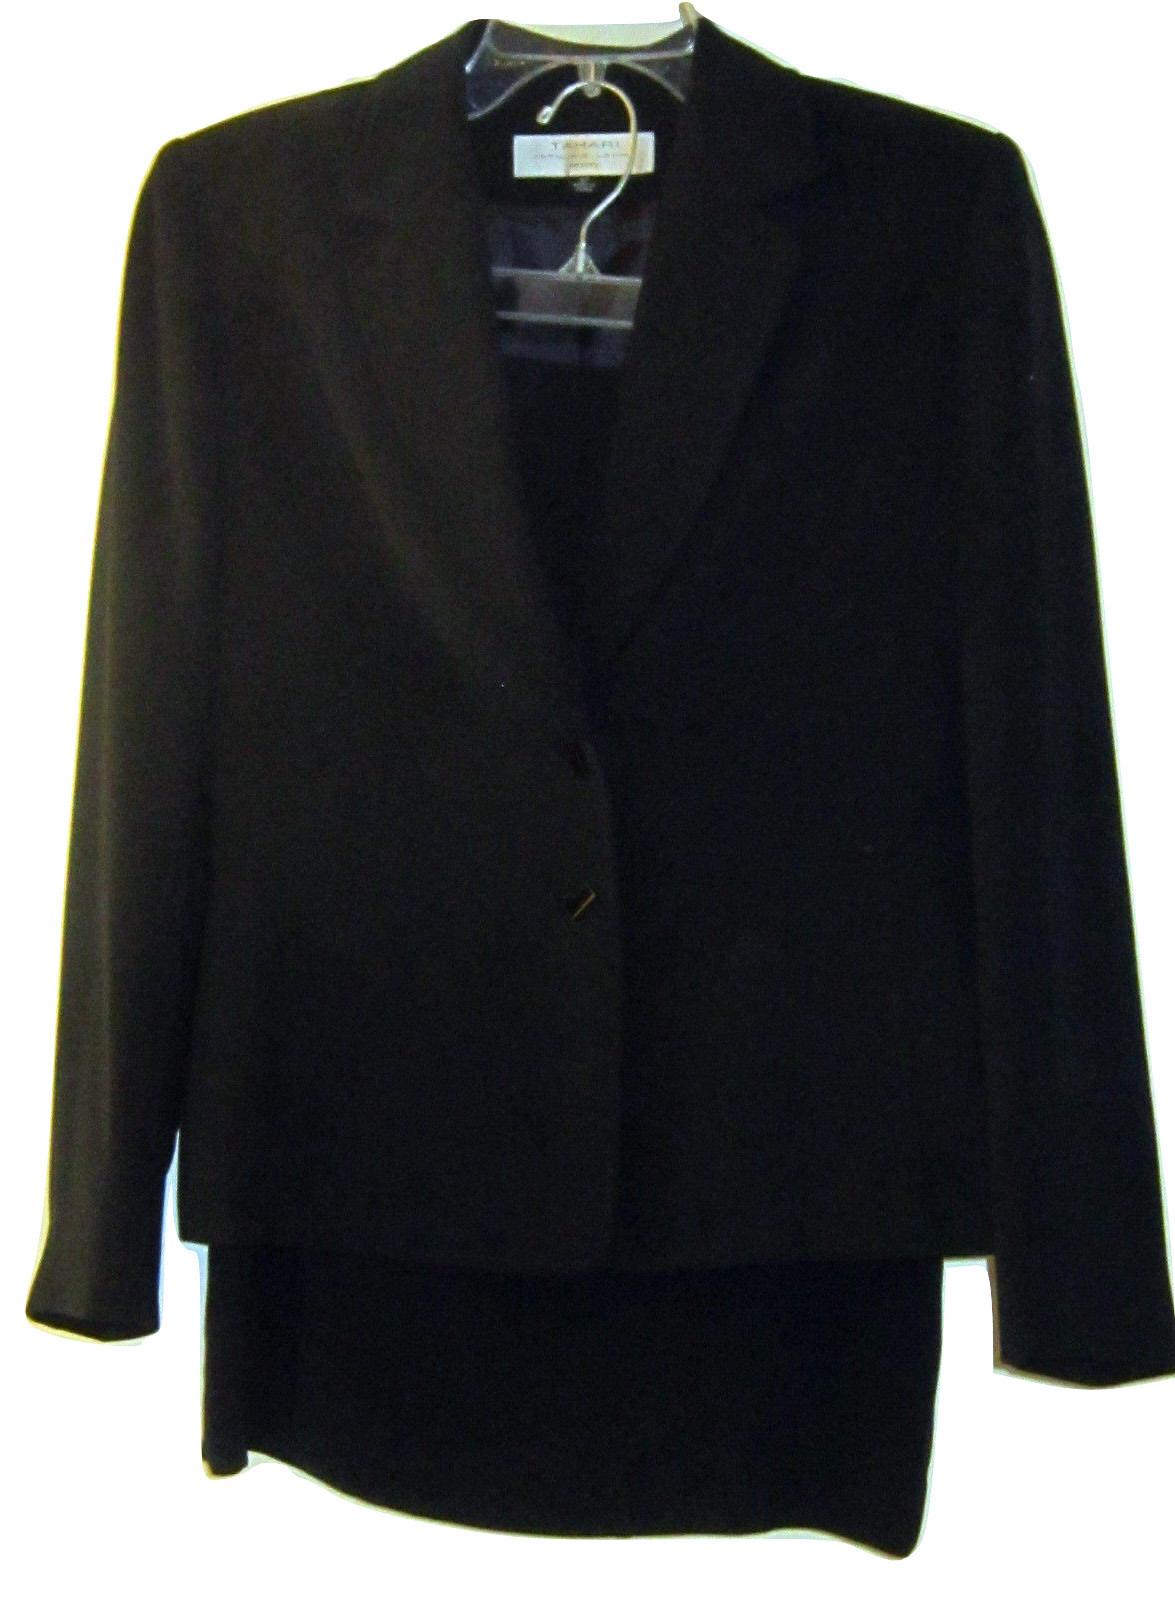 Tahari Arthur Levine Gray Black Stripe Straight Ponte Knit Skirt Sz 12 Career Women's Clothing